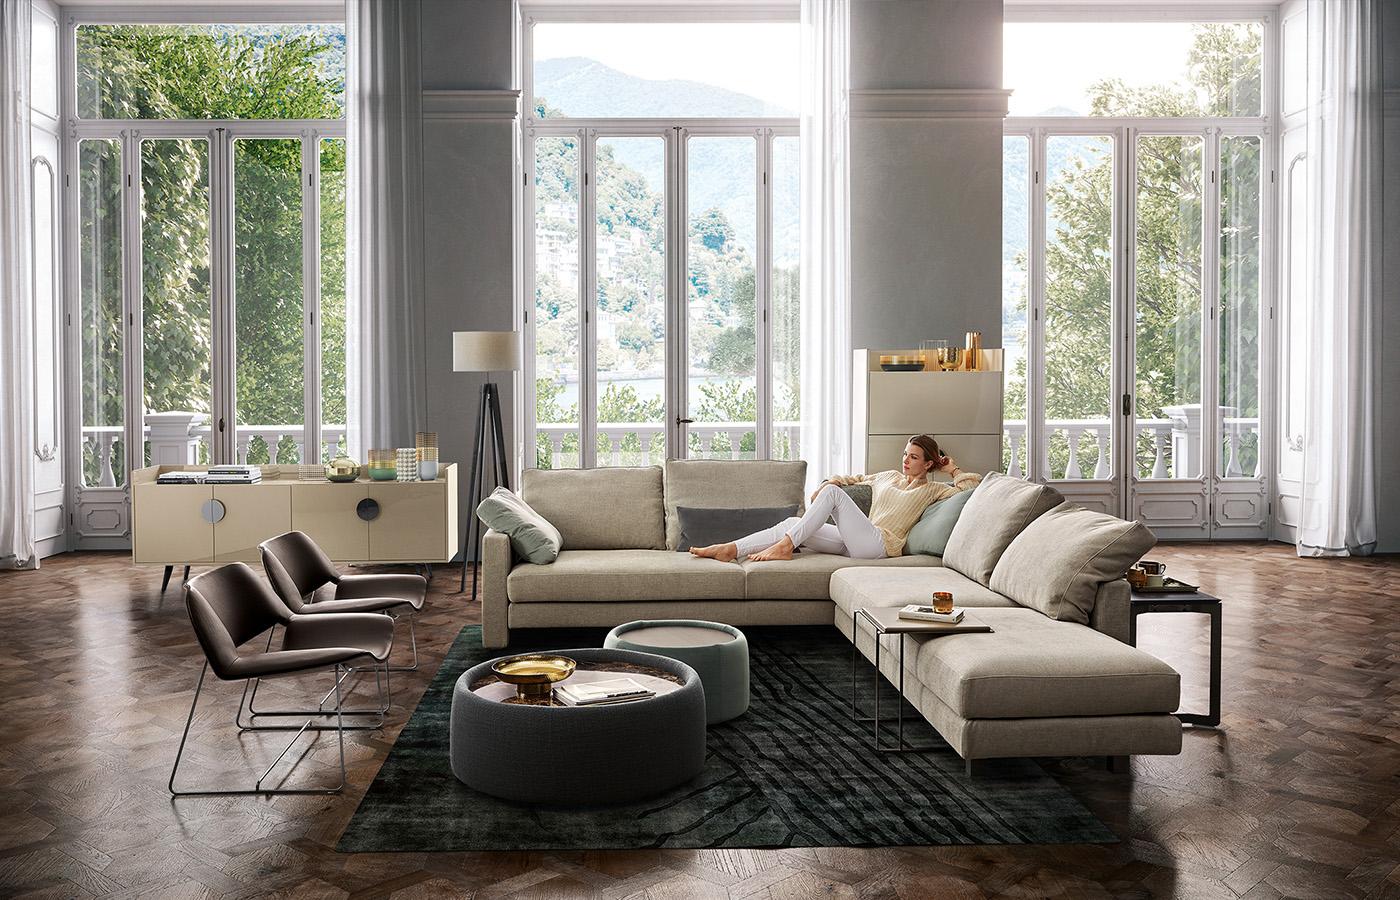 modular sofa babiloniadue dema. Black Bedroom Furniture Sets. Home Design Ideas